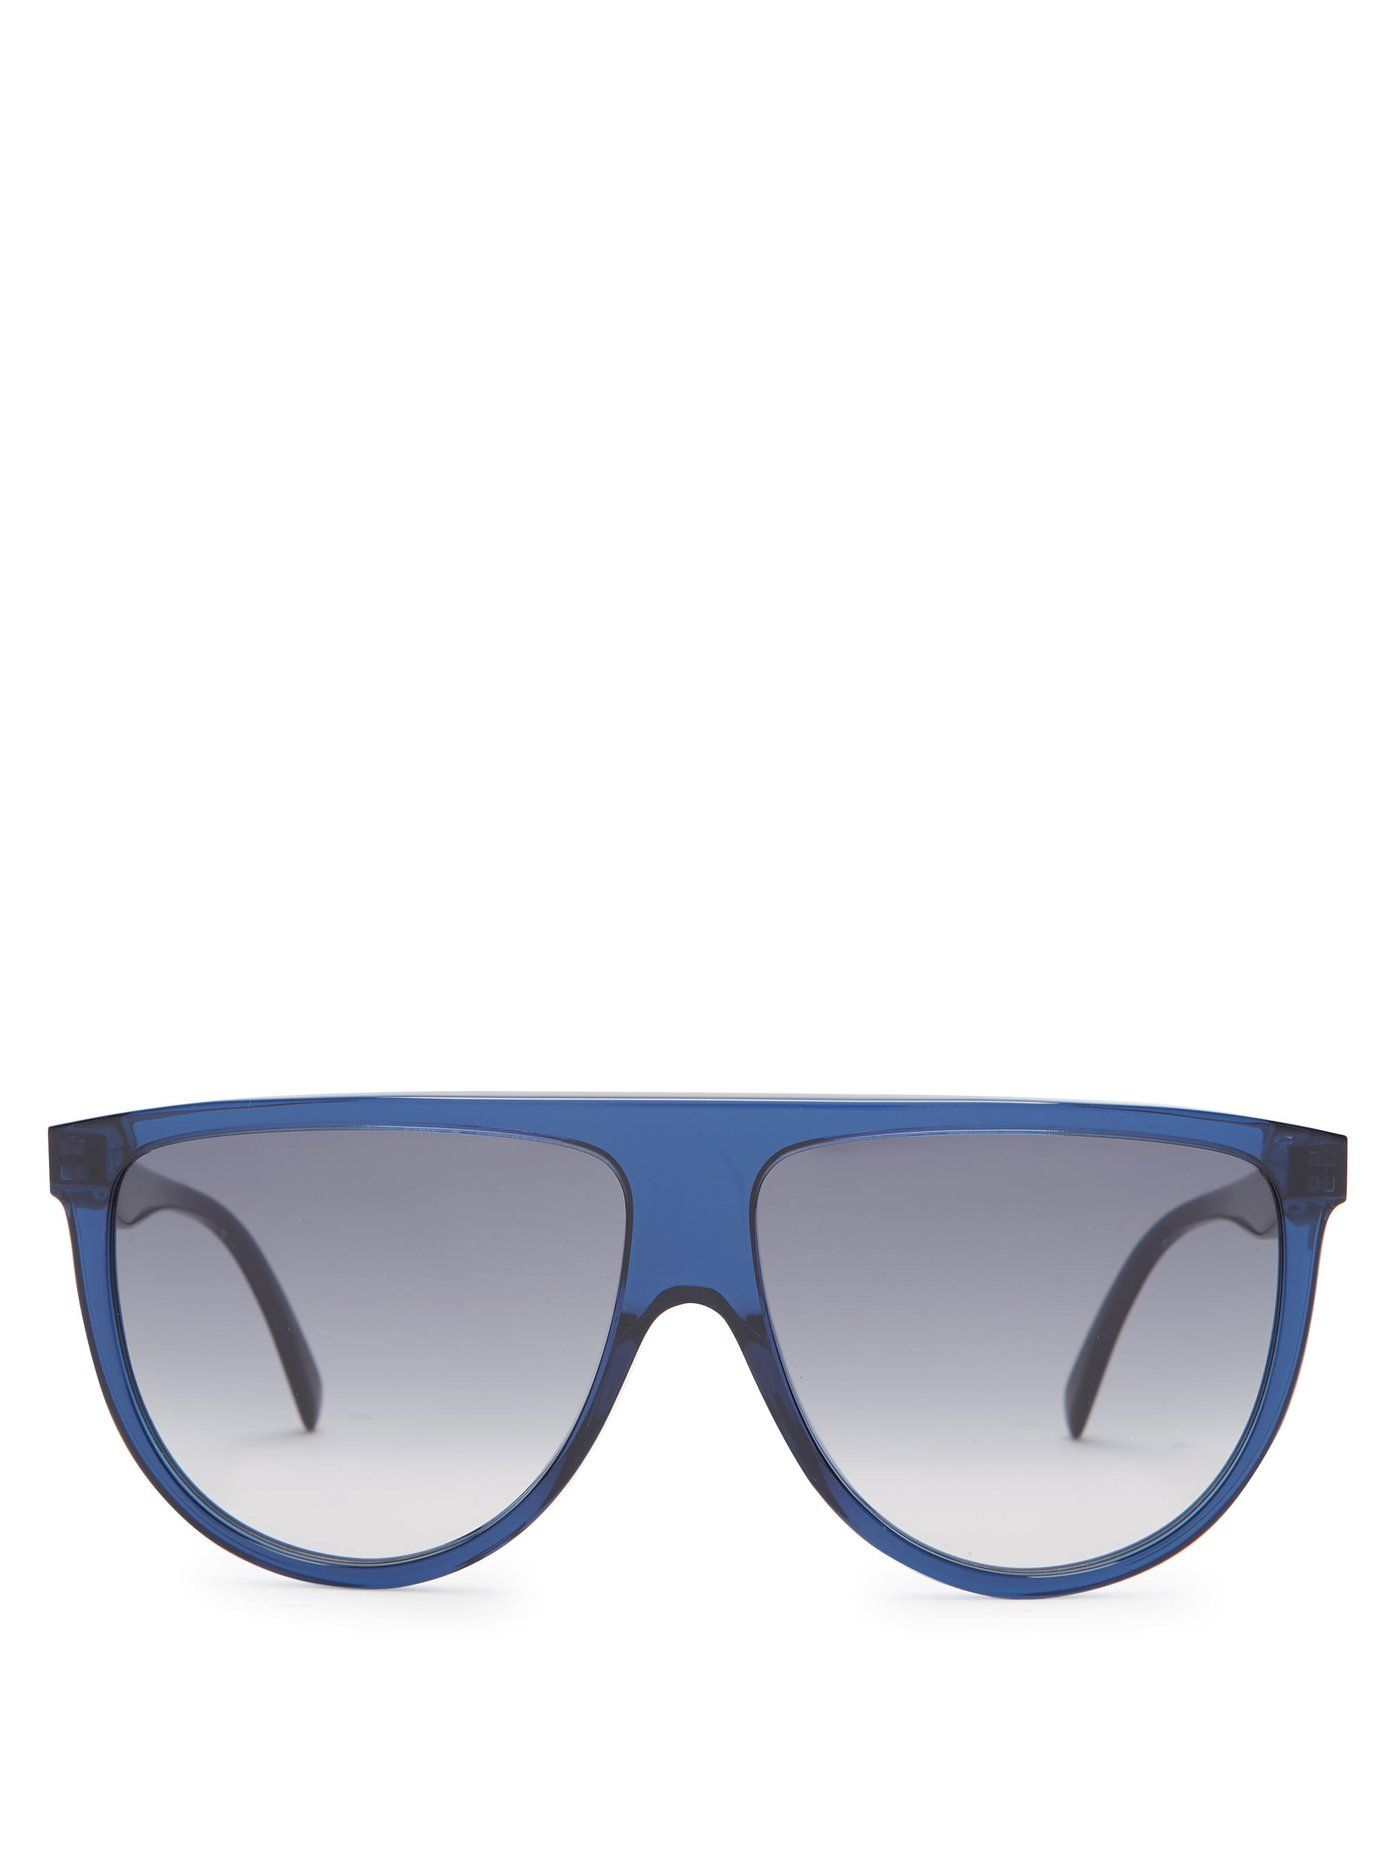 a1747abd71dd Shadow D-frame aviator sunglasses